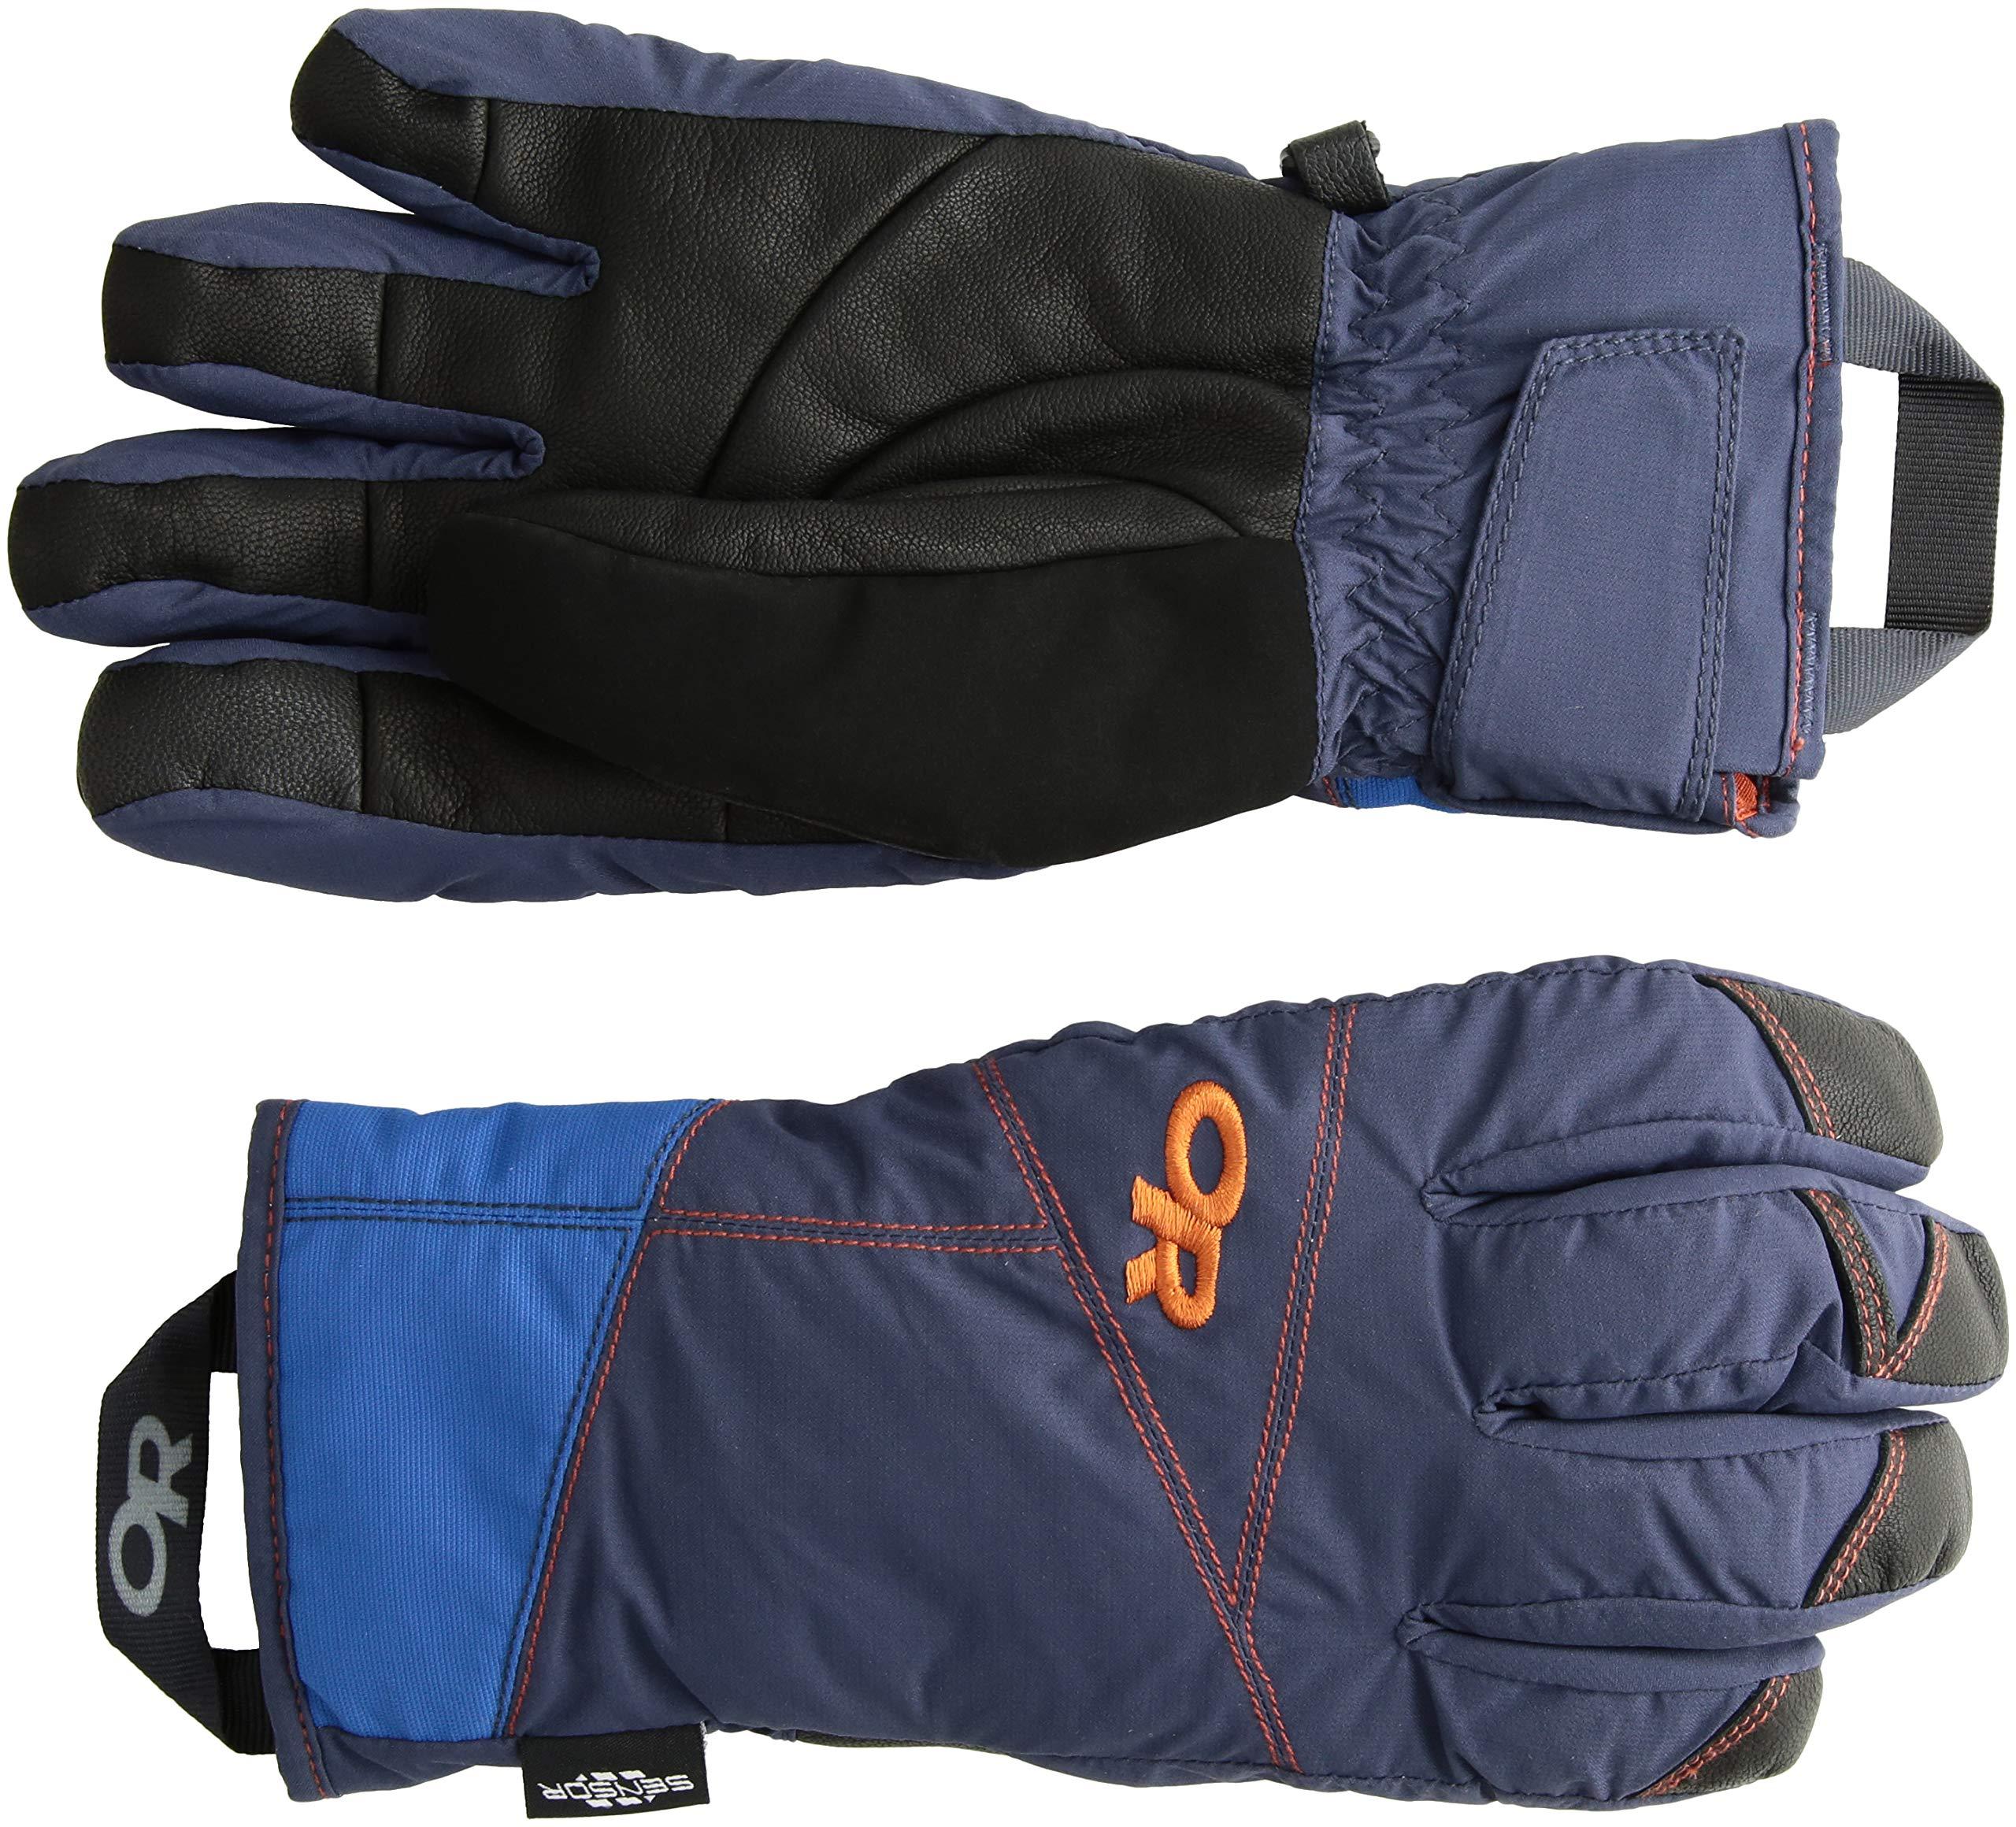 91X0ZC2ZDZL - Outdoor Research Illuminator Sensor Gloves